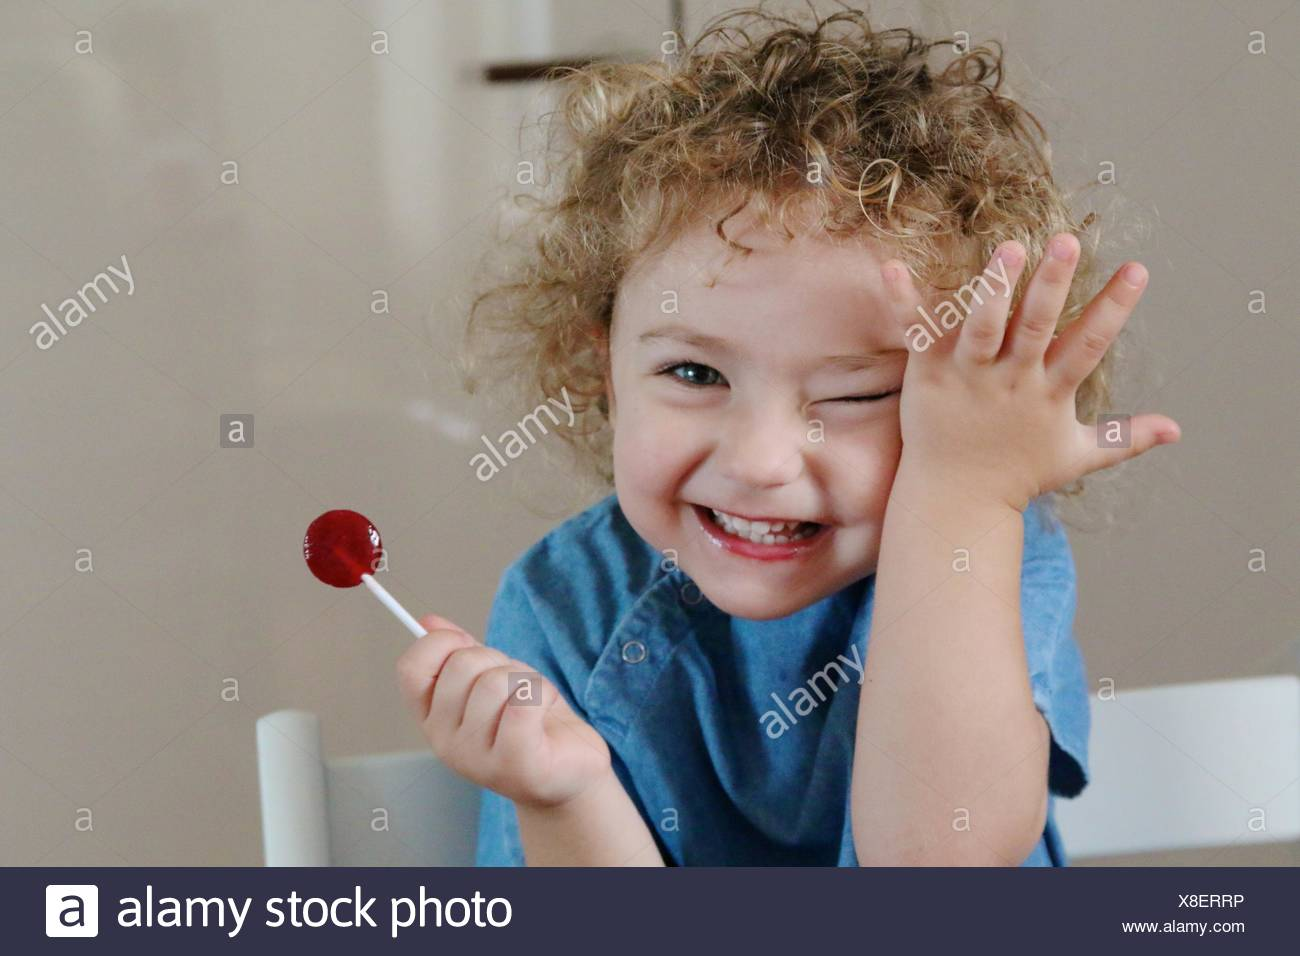 Chica (2-3) con piruleta sonriendo Imagen De Stock